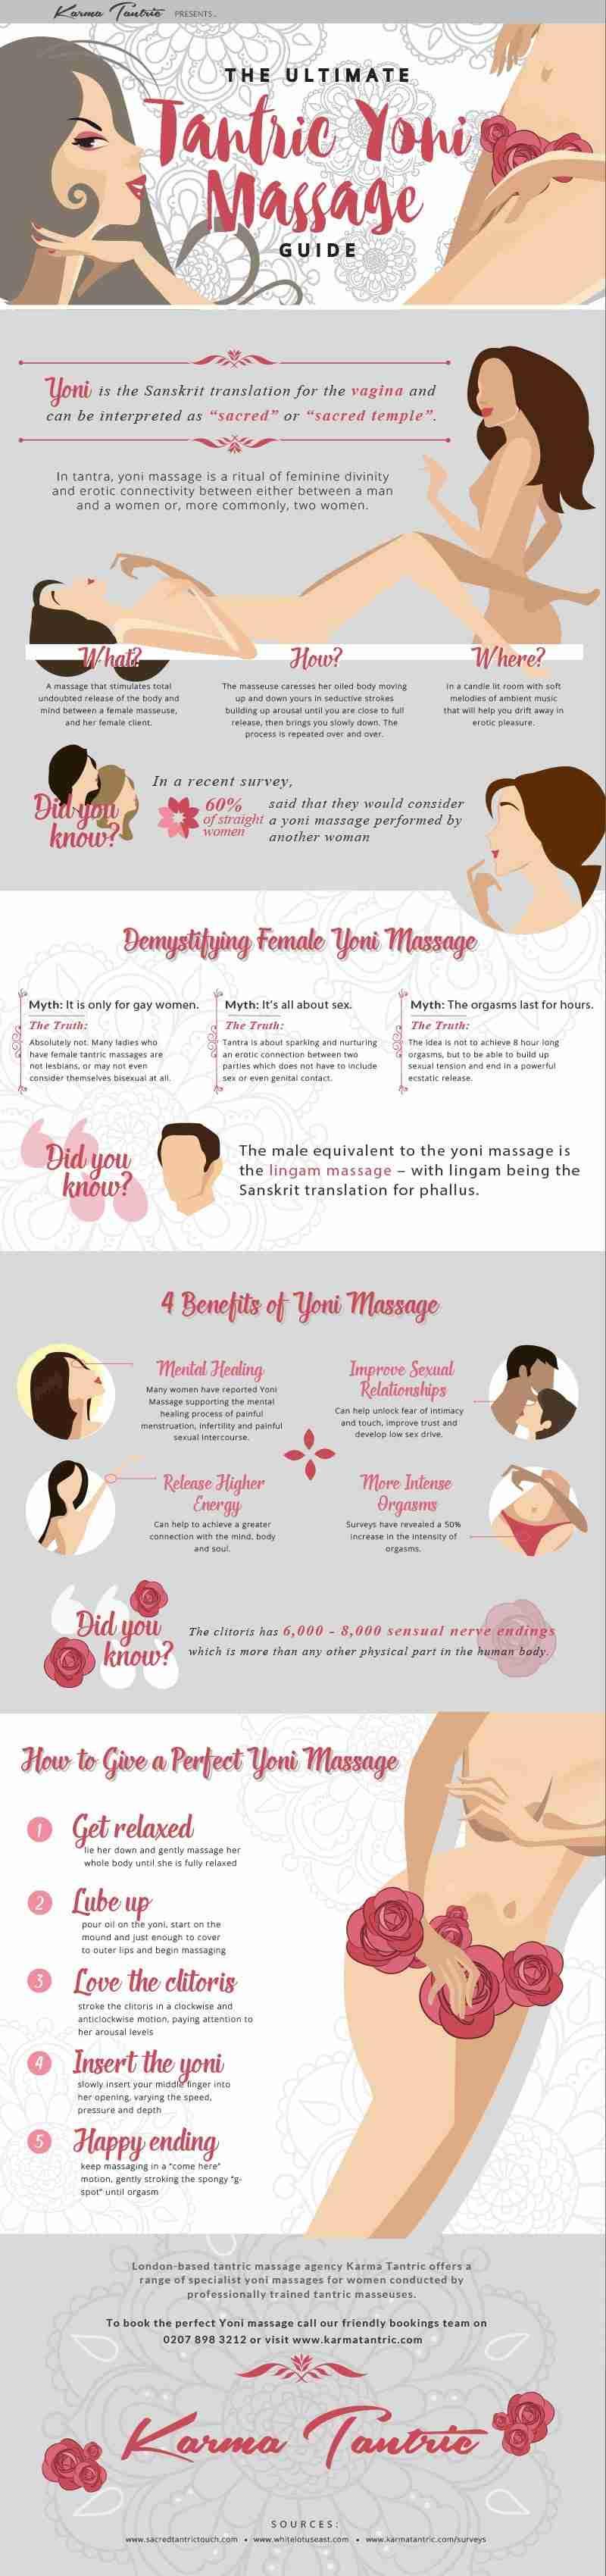 The Ultimate Yoni Massage Guide